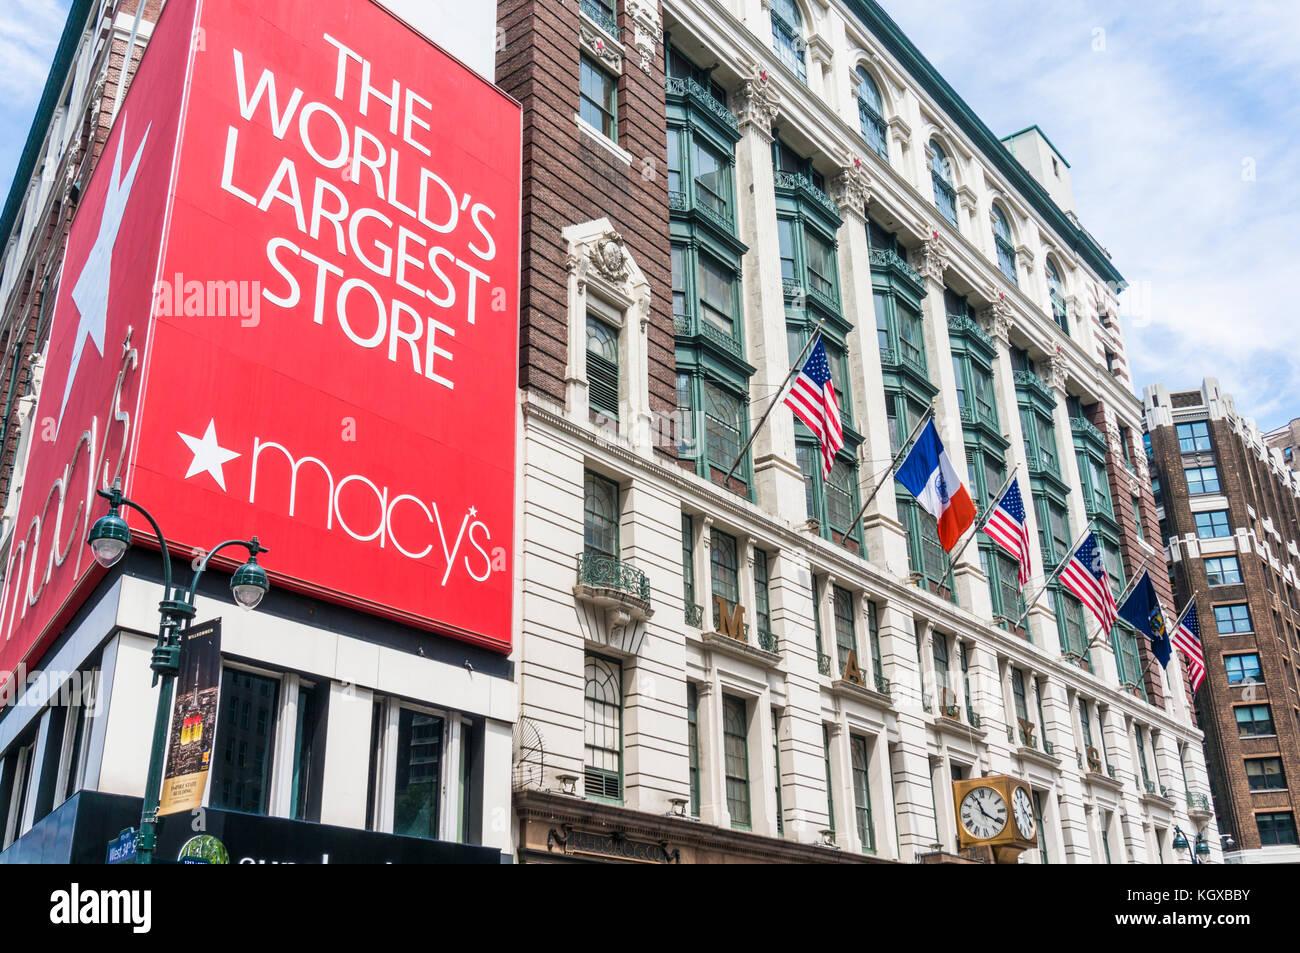 Macys New york usa new york macys department store Macy's Herald Square flagship of Macy's department store - Stock Image